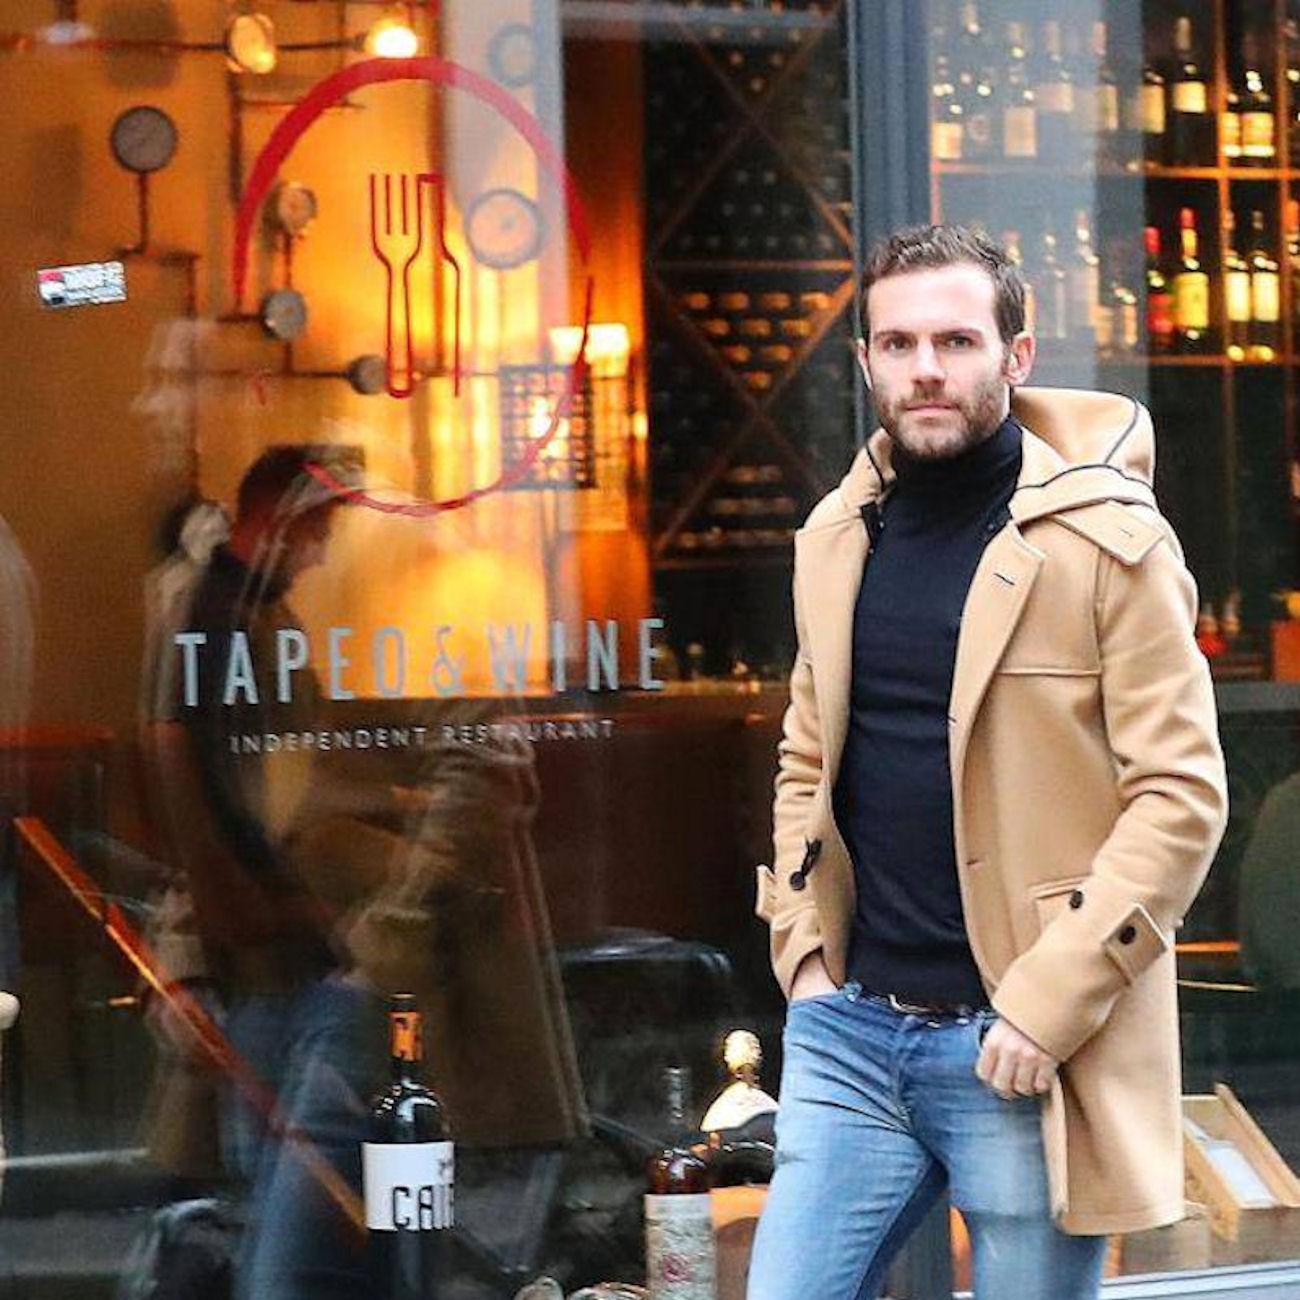 Manchester Restaurants - Tapeo